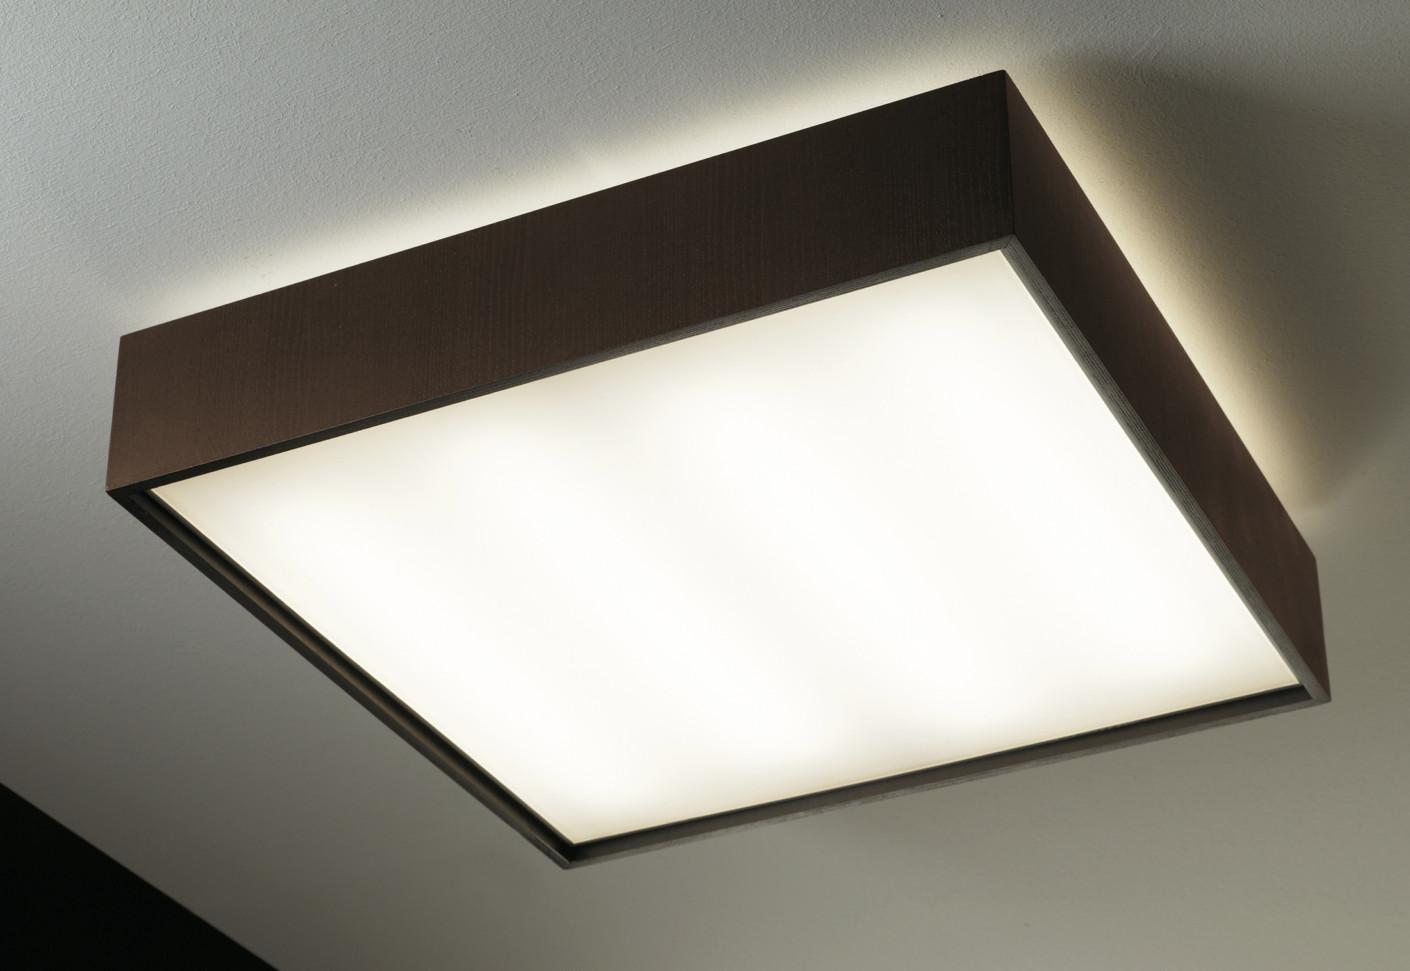 Quadrat C120x120 Plafón LED 6x24,8W - blanco